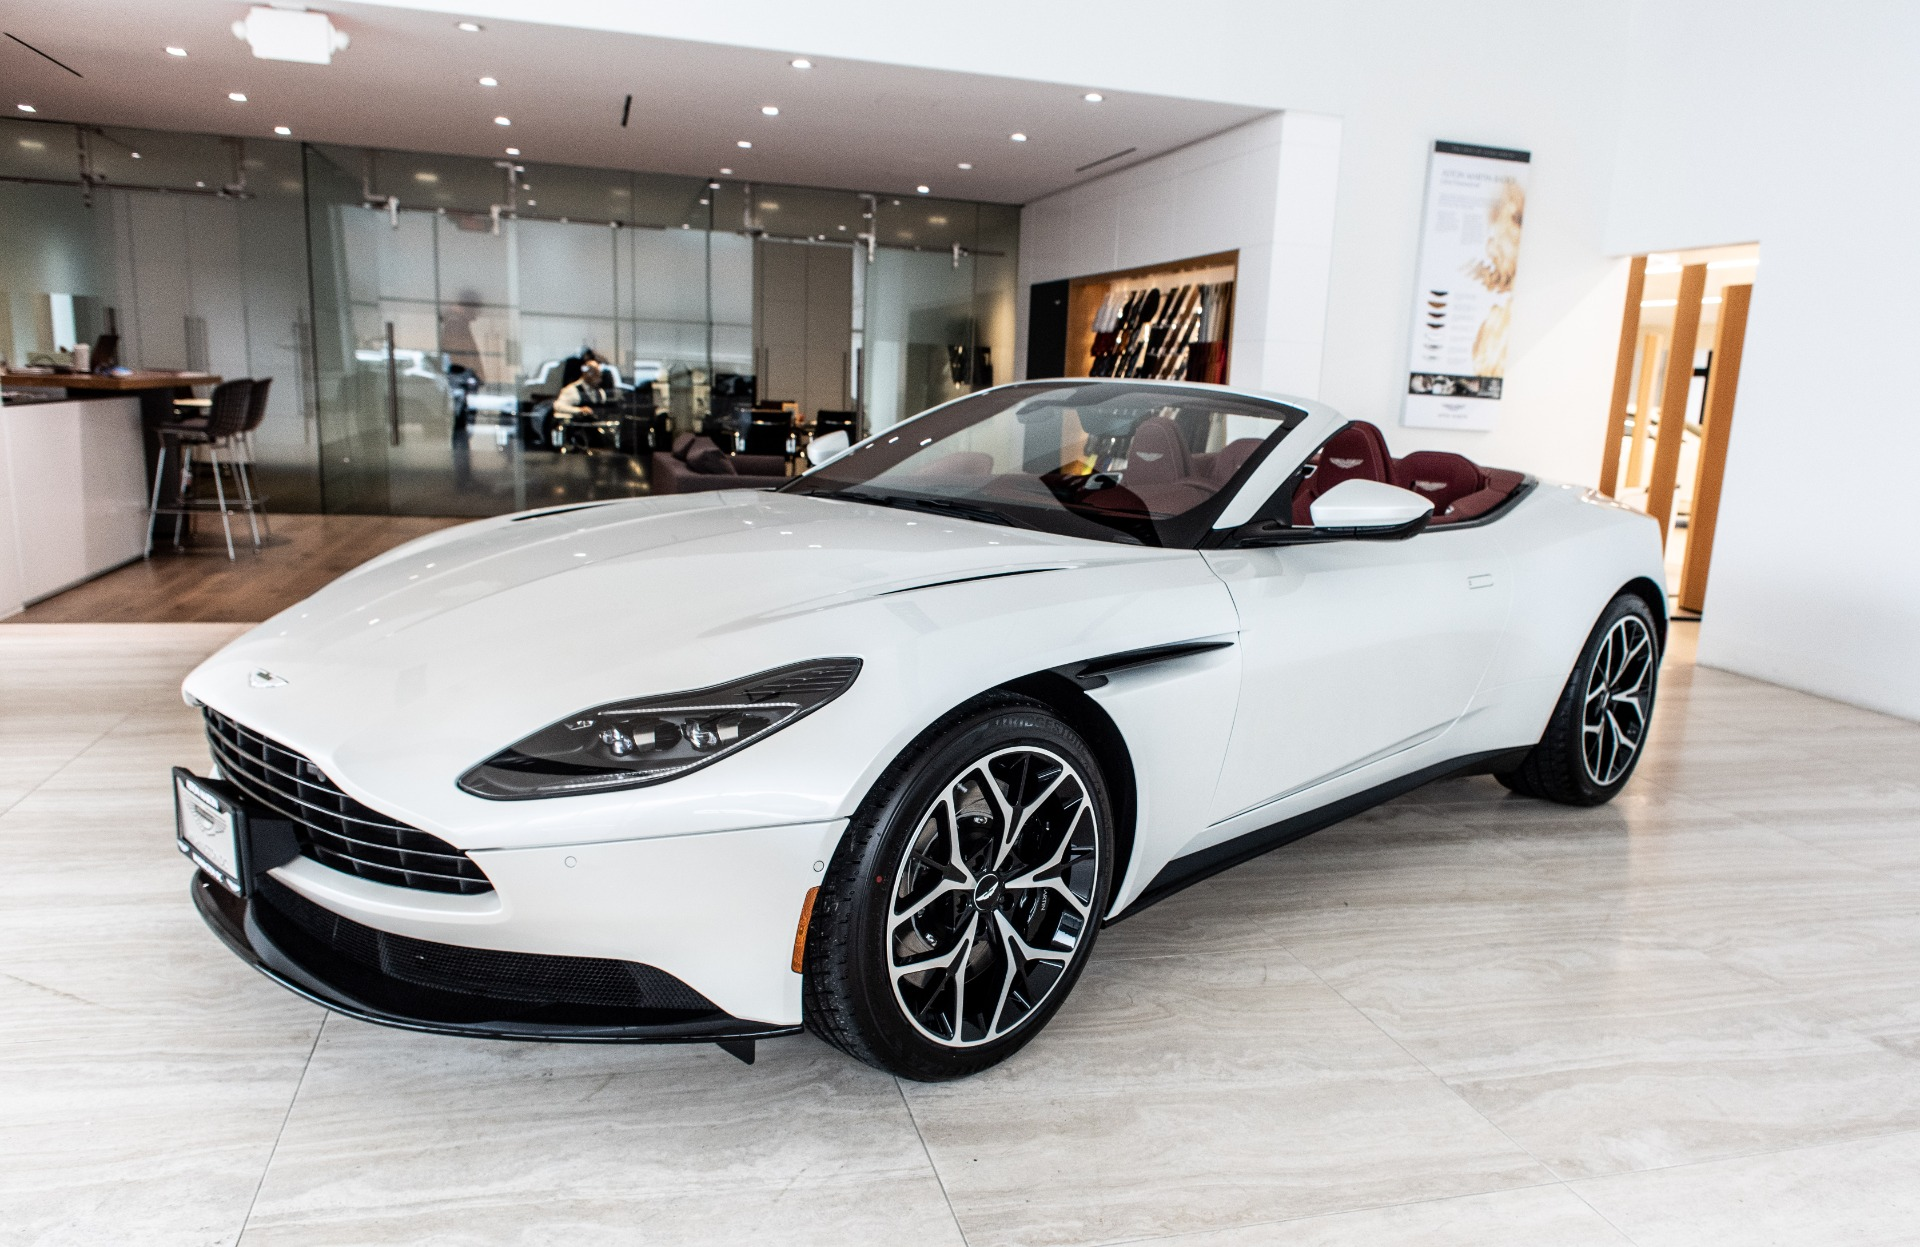 2019 Aston Martin Db11 Volante Stock 9nm06978 For Sale Near Vienna